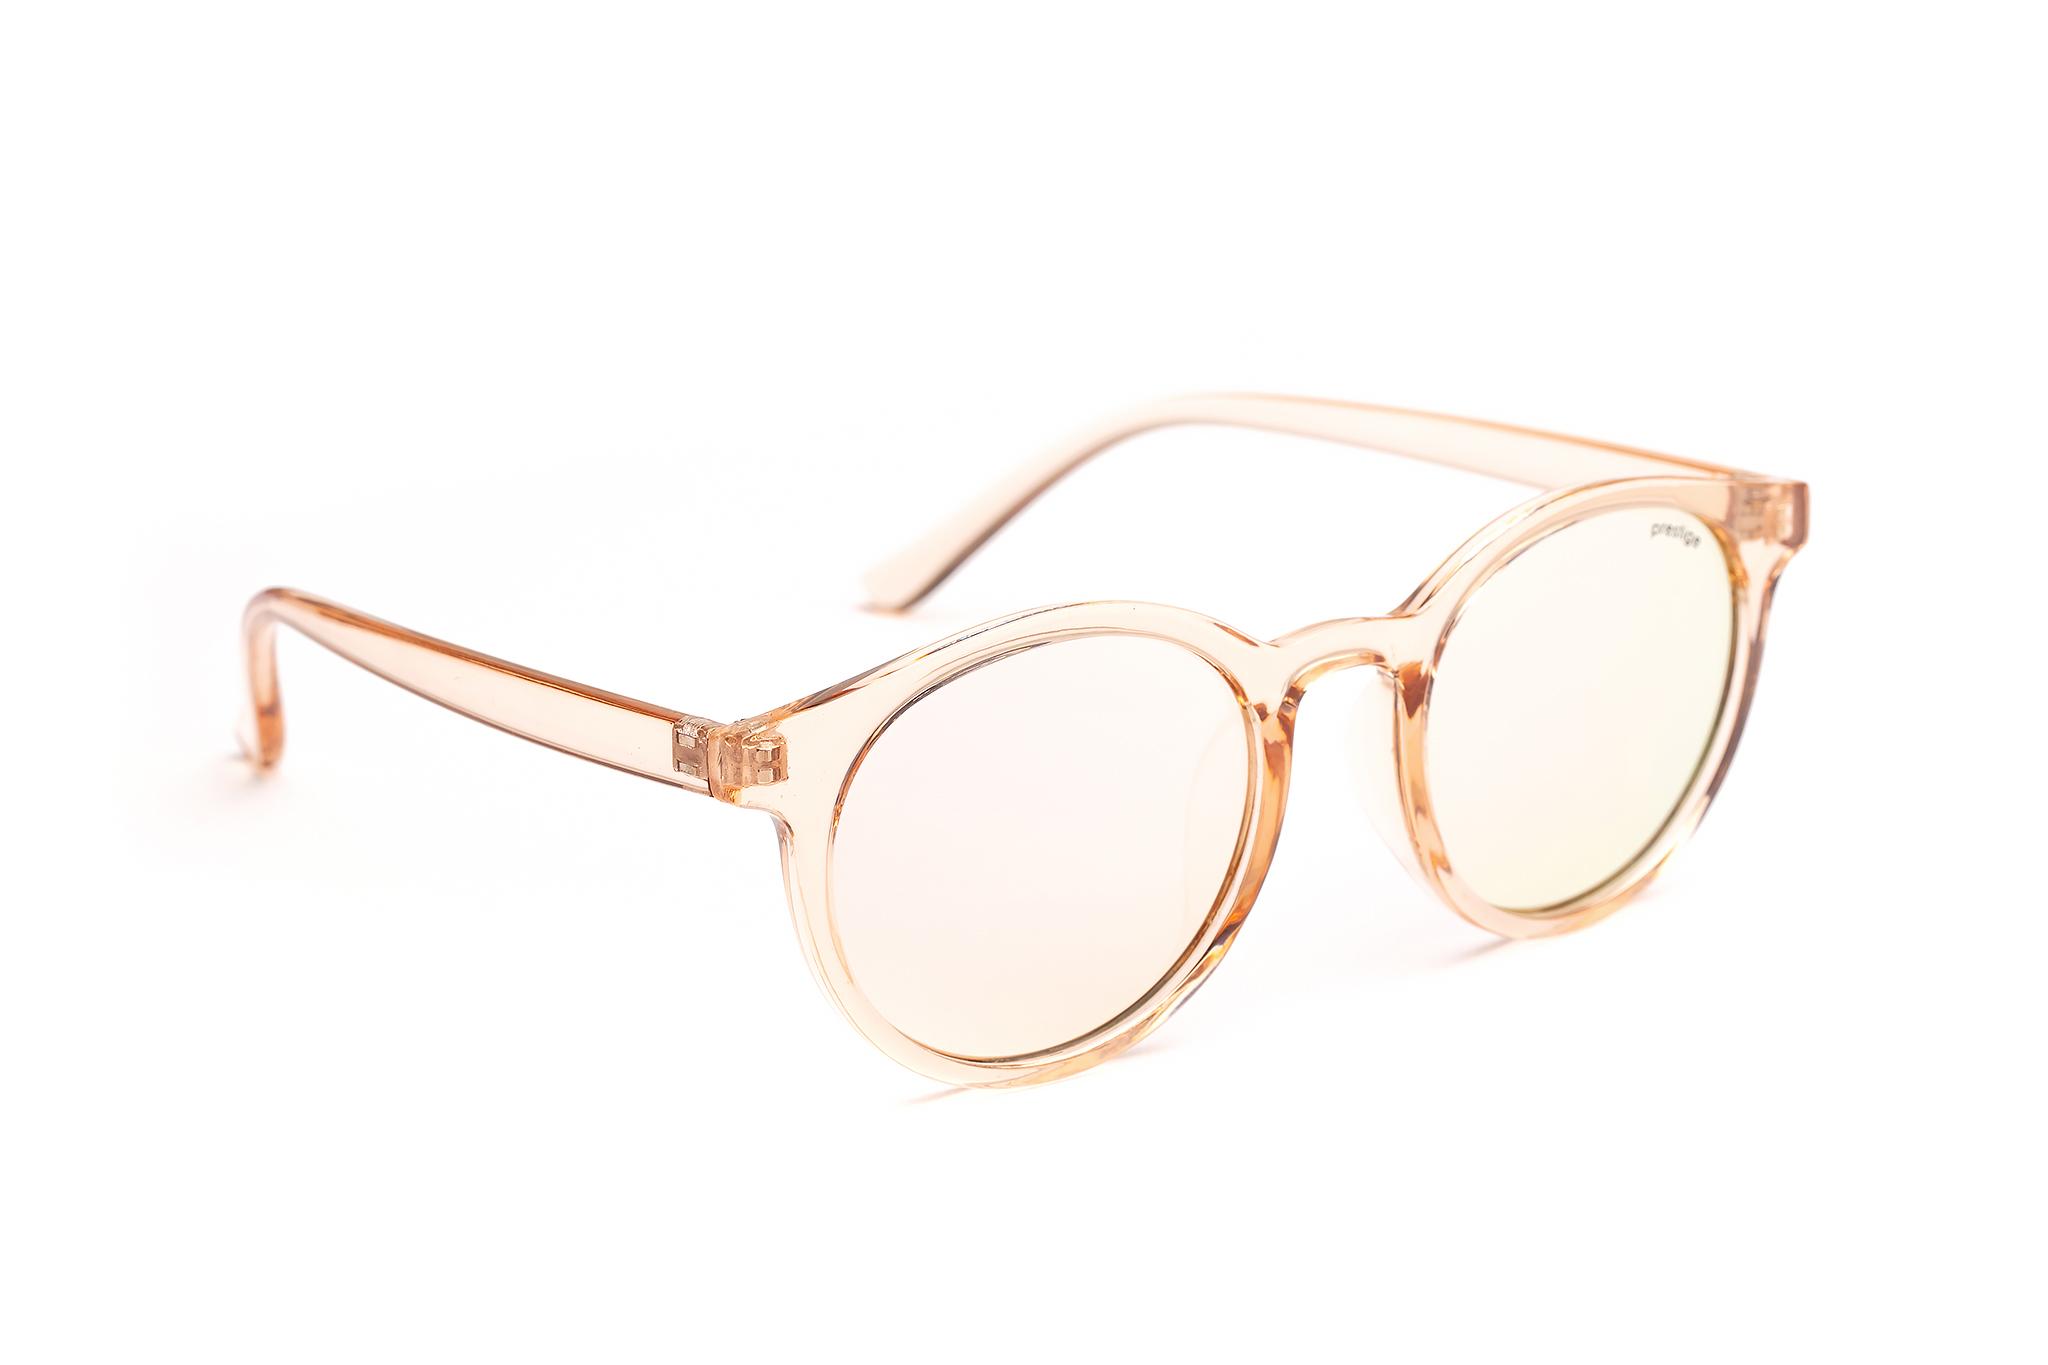 Årets solglasögons nyheter   Shoppa nyheterna   Prestige A